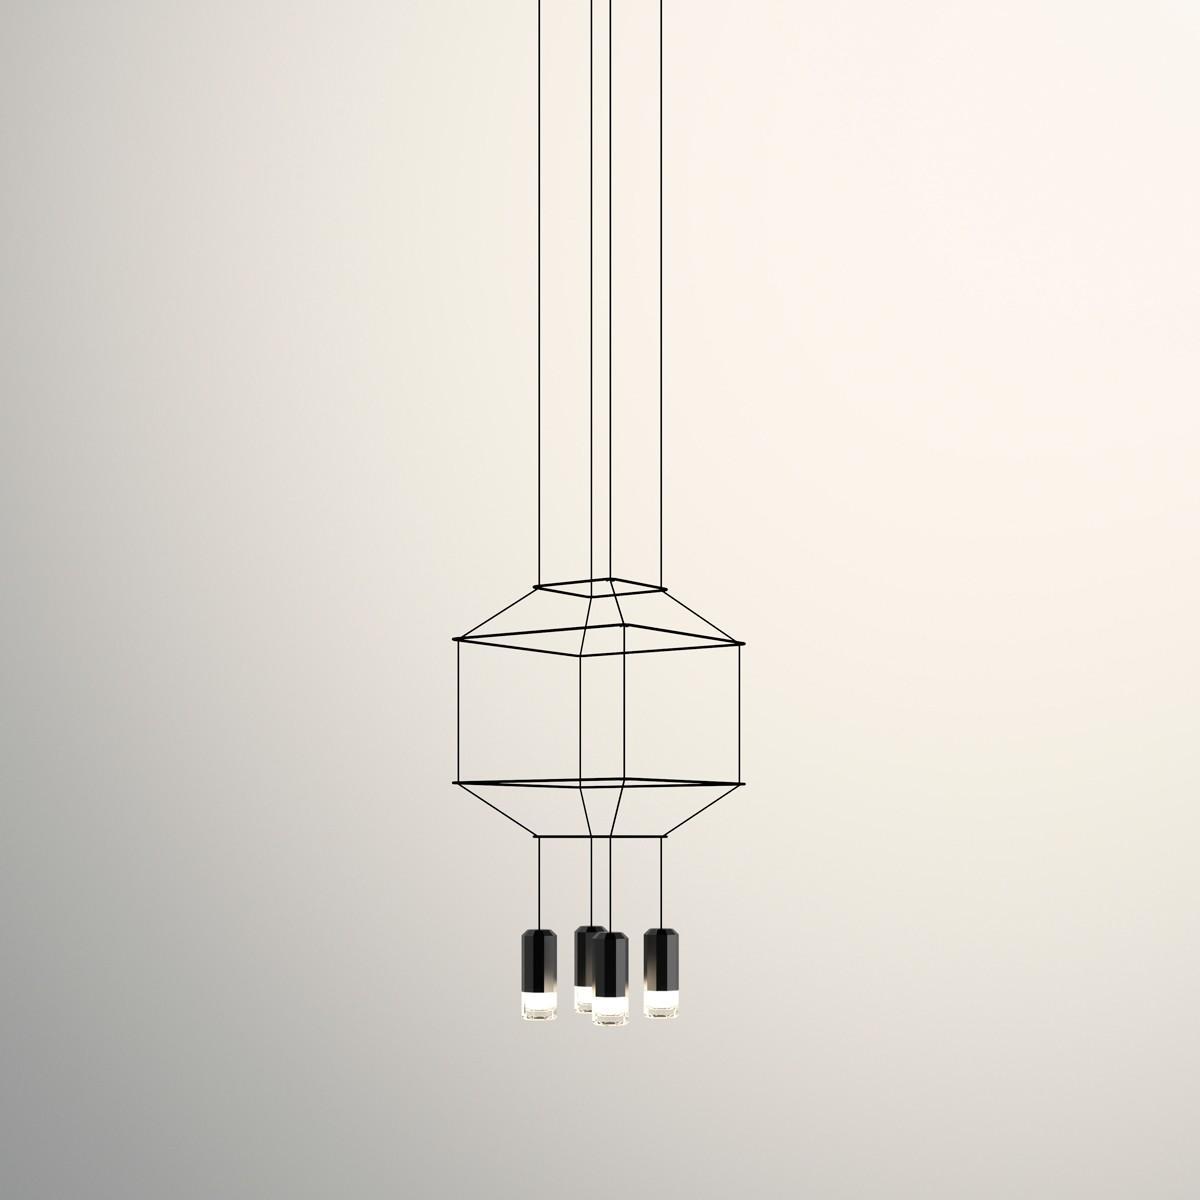 Vibia Wireflow Pendelleuchte, 4-flg., 50 x 50 cm, schwarz